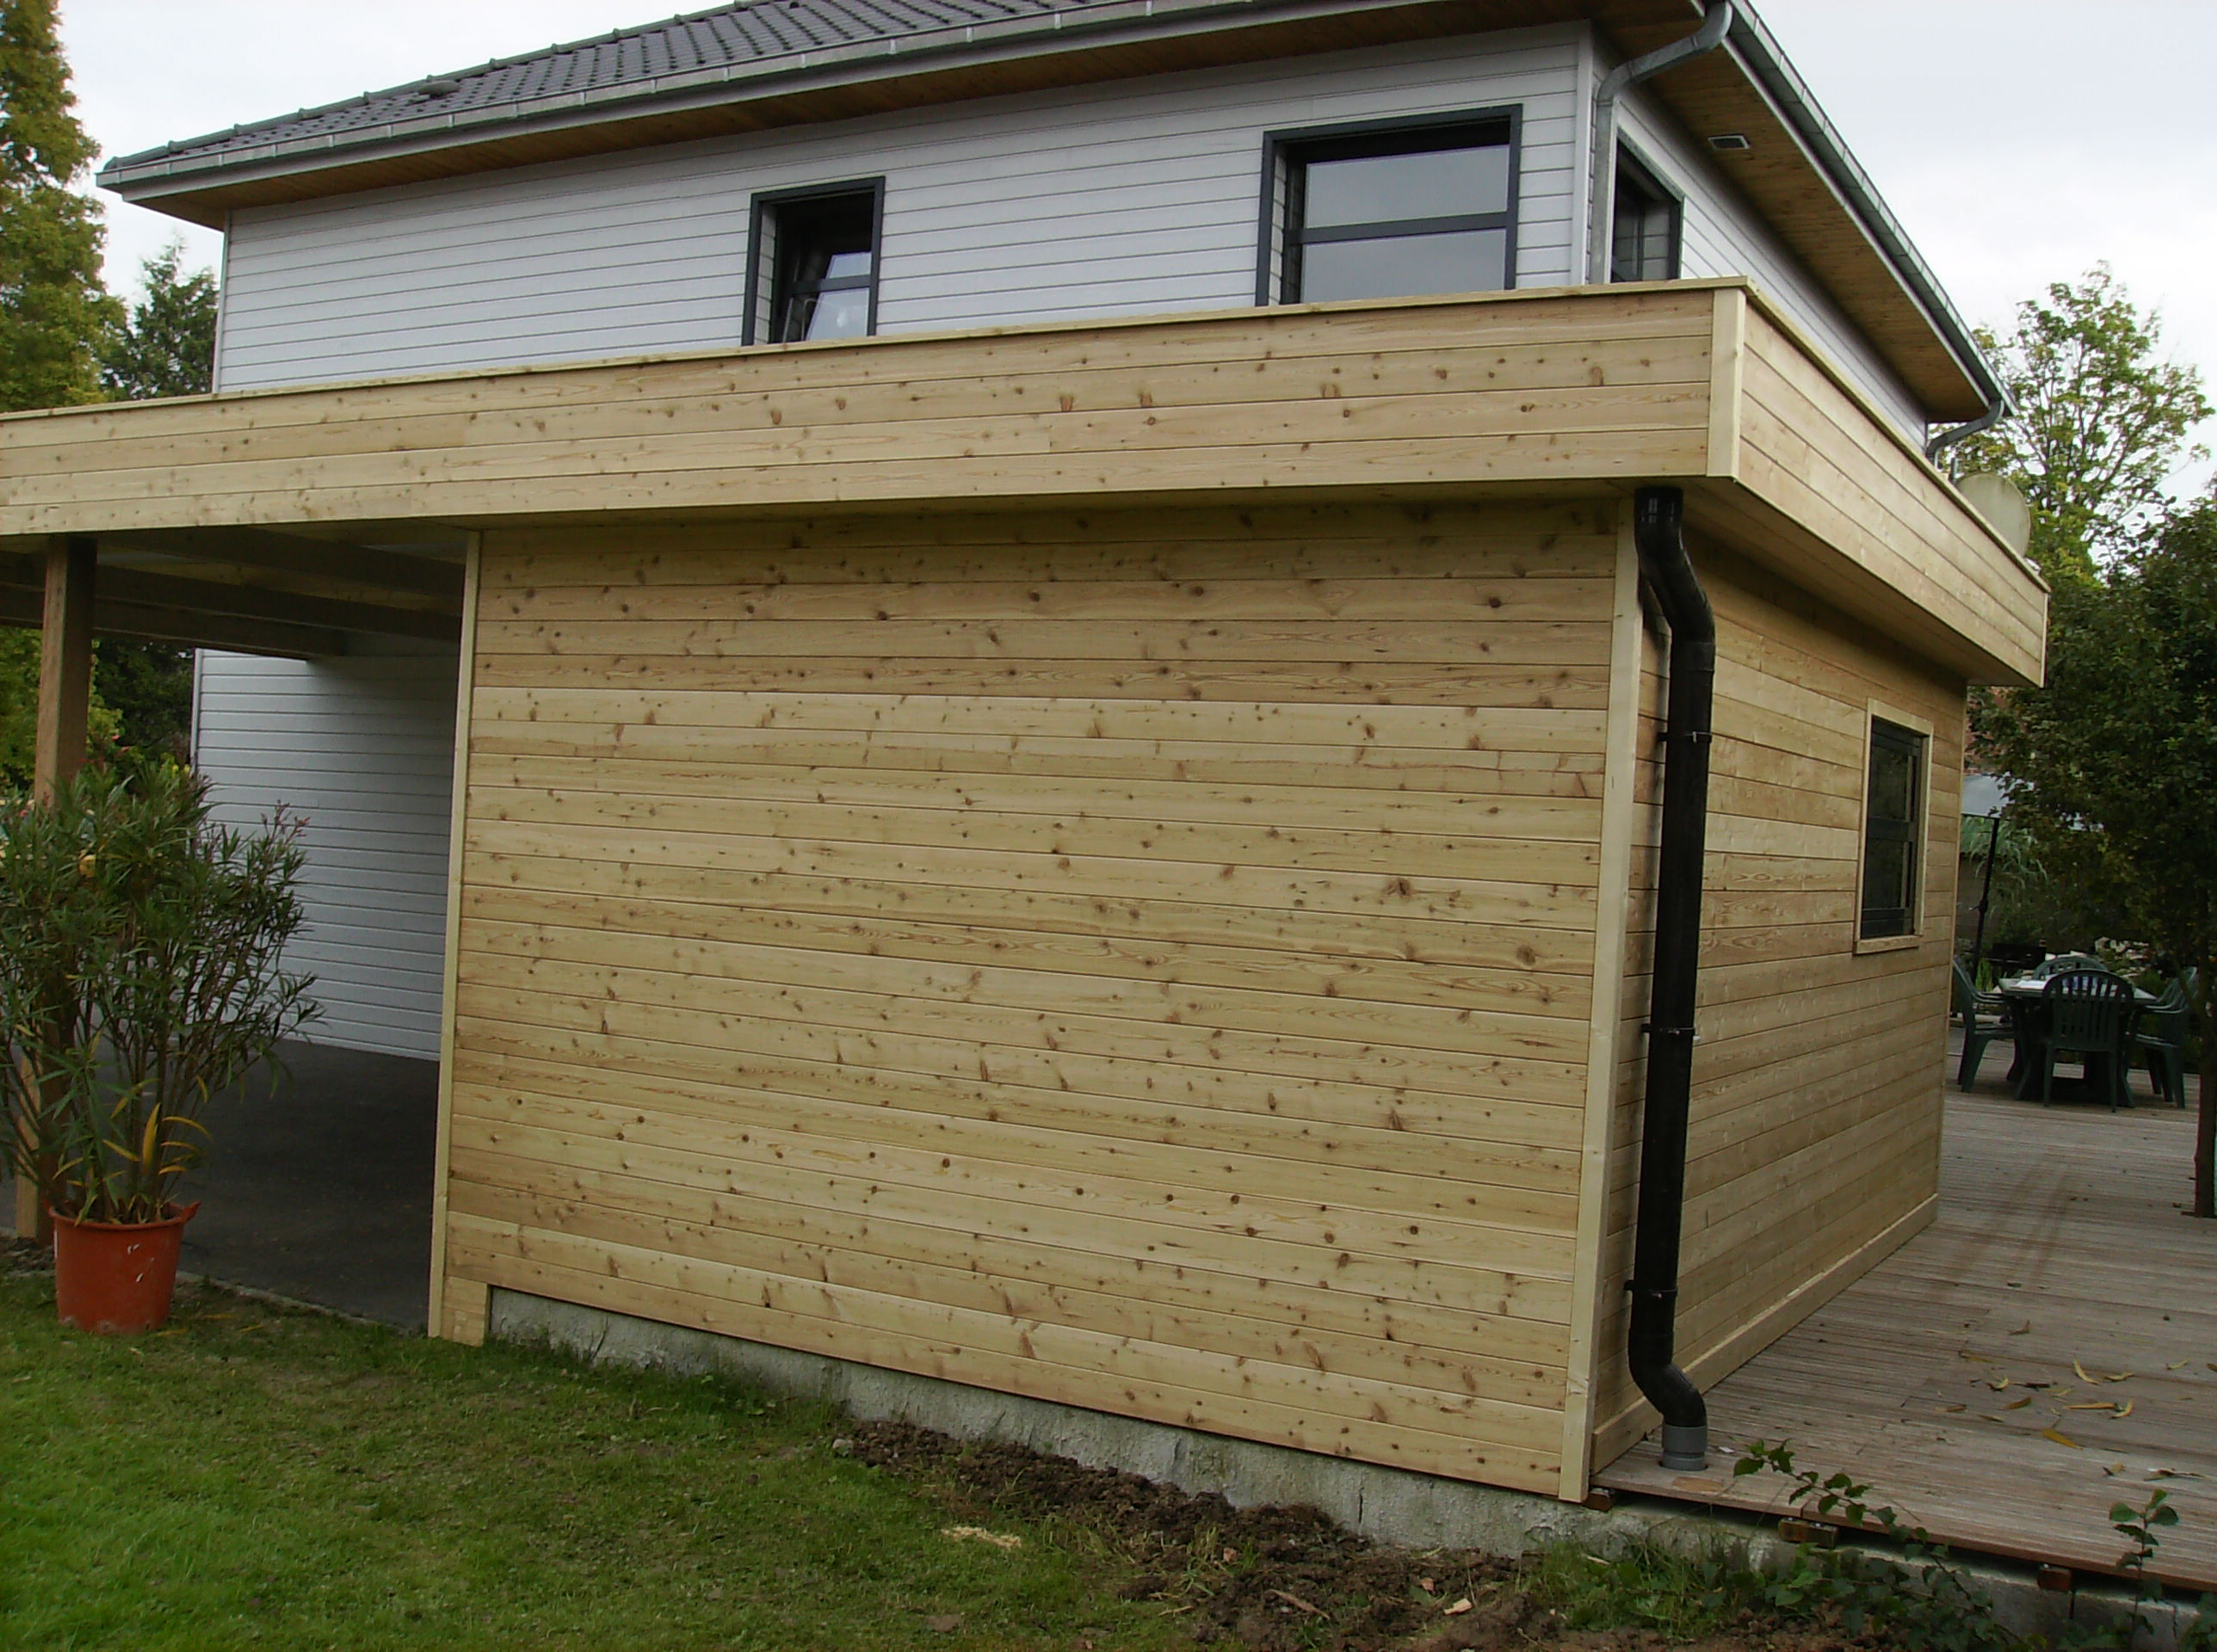 Abris toit plat daniel decadt houten constructies houthandel proven - Abri de jardin toit plat tek ...